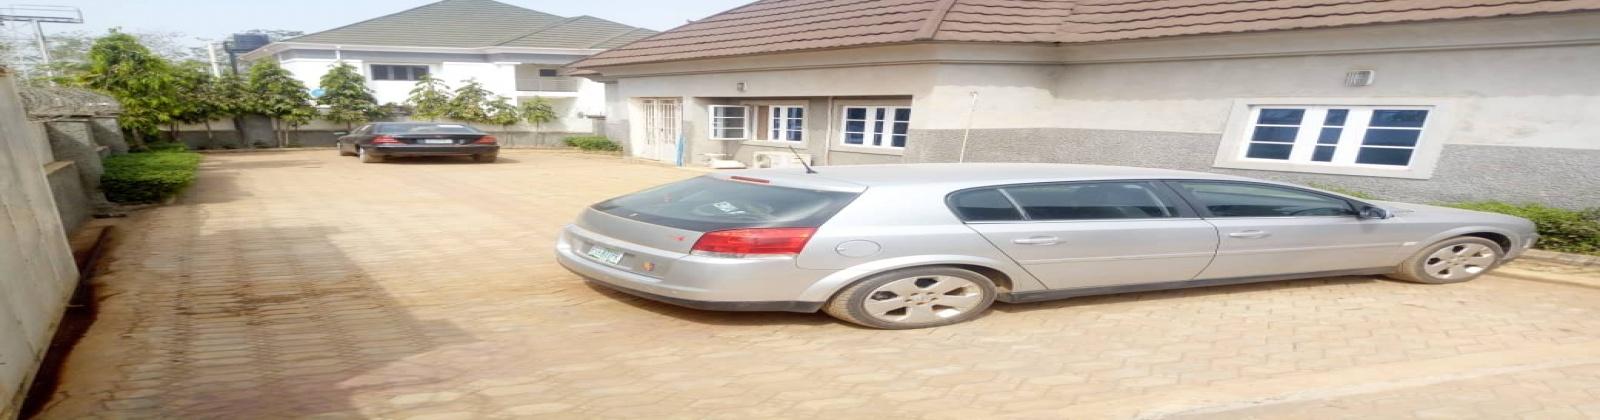 Santos estate Dakwo district, ABUJA, Abuja, 3 Bedrooms Bedrooms, 8 Rooms Rooms,3 BathroomsBathrooms,Apartment,For Sale,Santos estate Dakwo district,1005